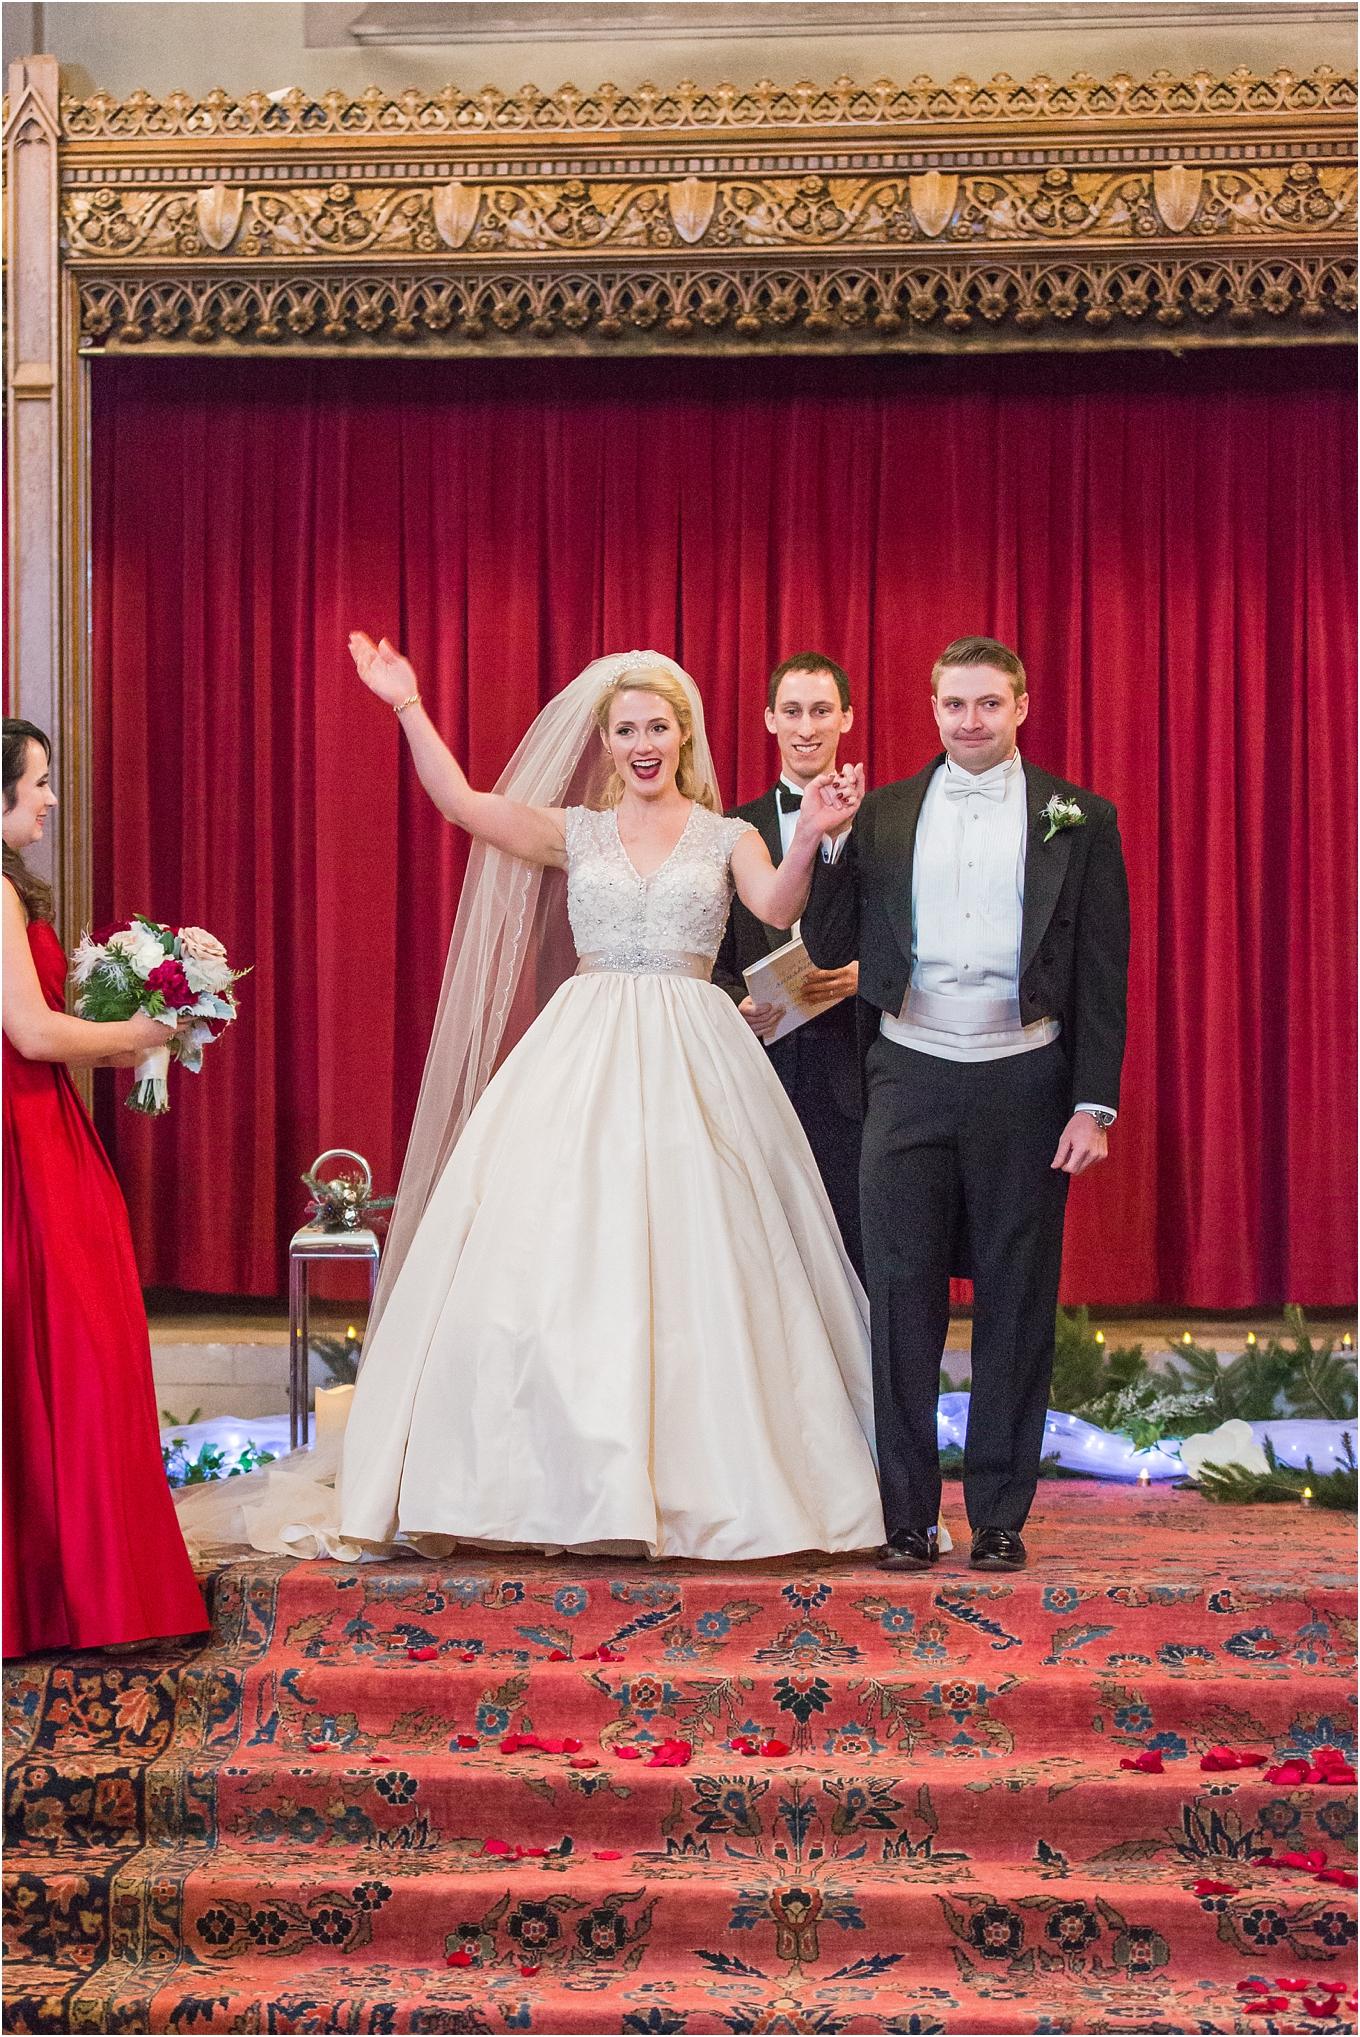 elegant-classic-fairytale-wedding-photos-in-detroit-mi-at-the-masonic-temple-by-courtney-carolyn-photography_0107.jpg